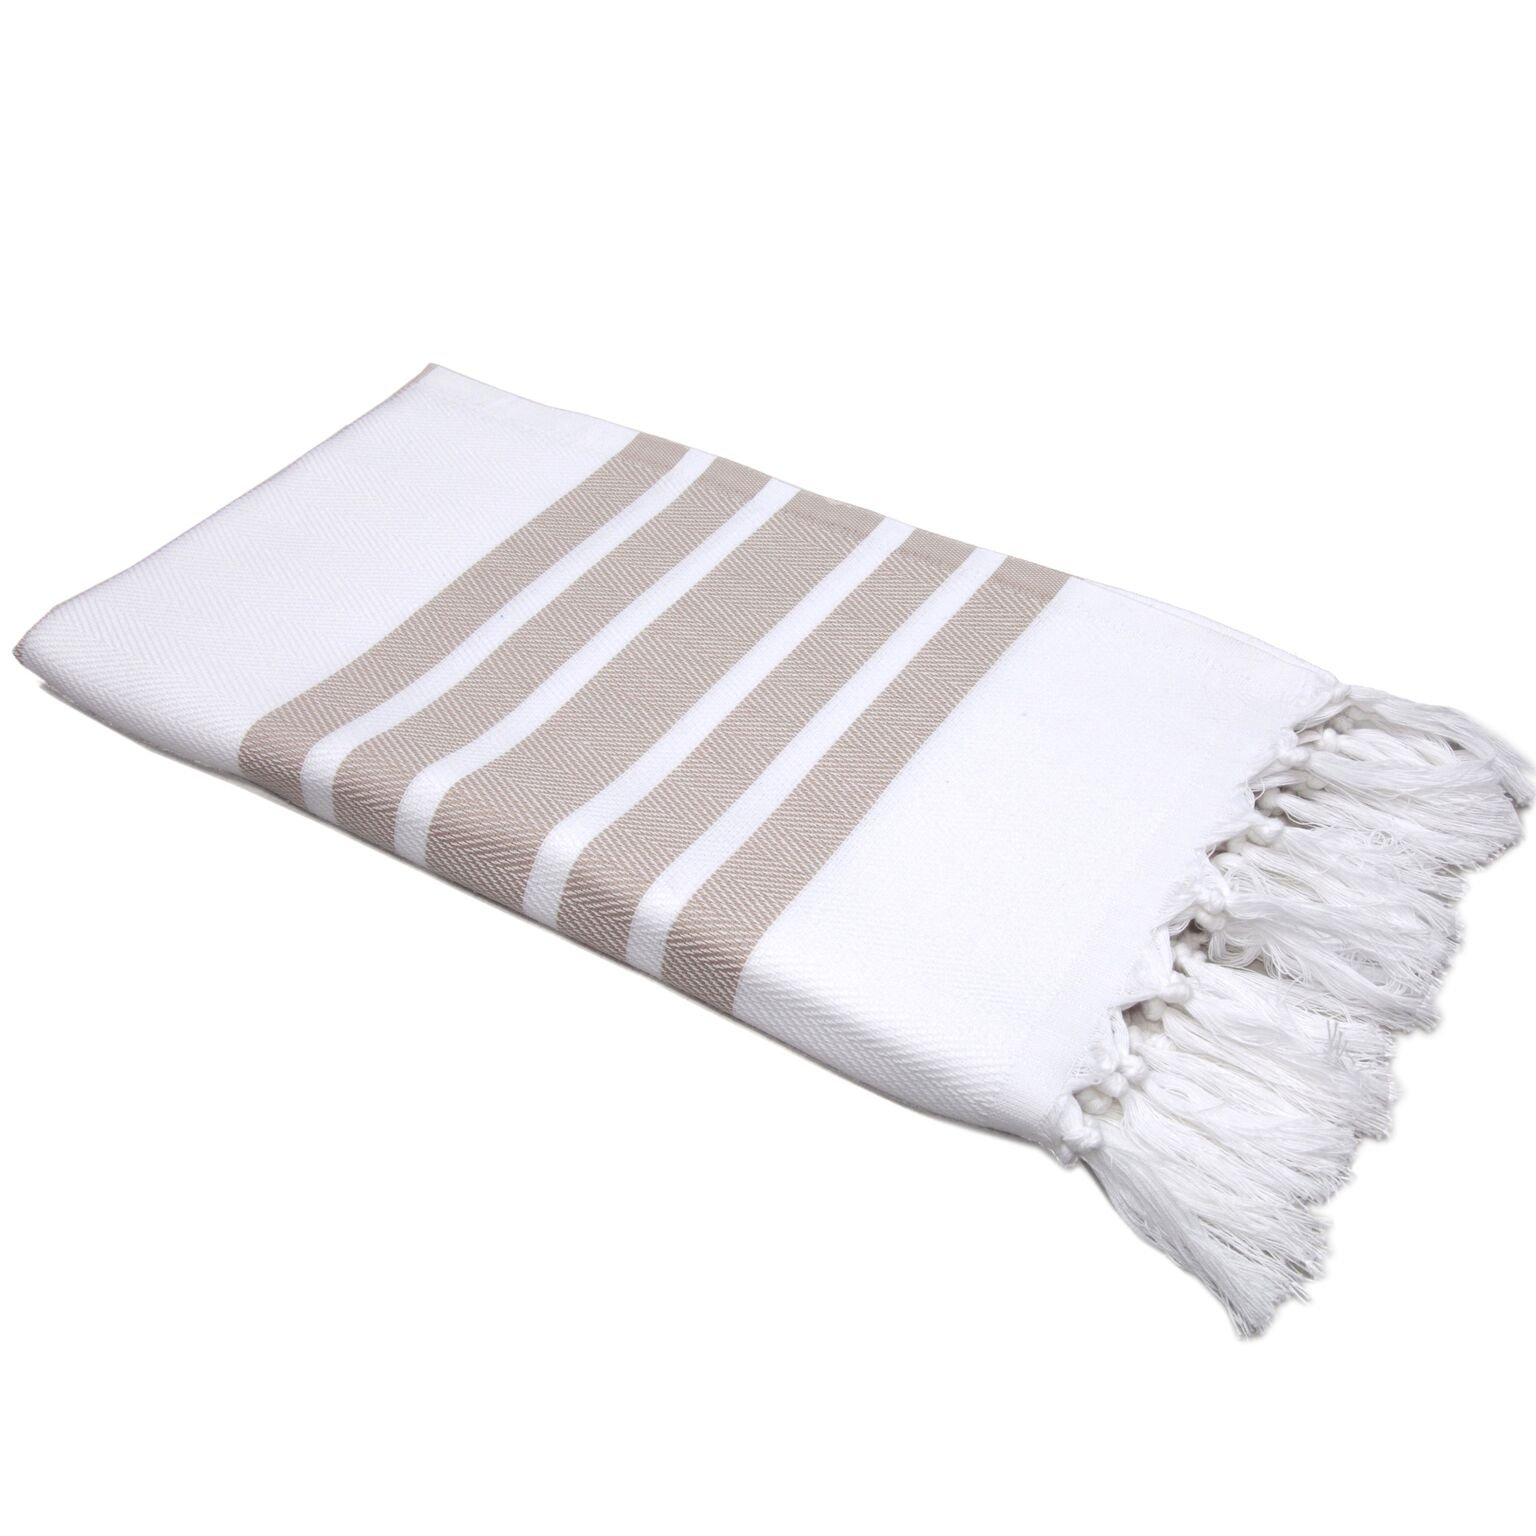 Linum Home Textiles Turkish Cotton Herringbone Pestemal, Peshtemal, Fota Beach Bath Towel by Linum Home Textiles